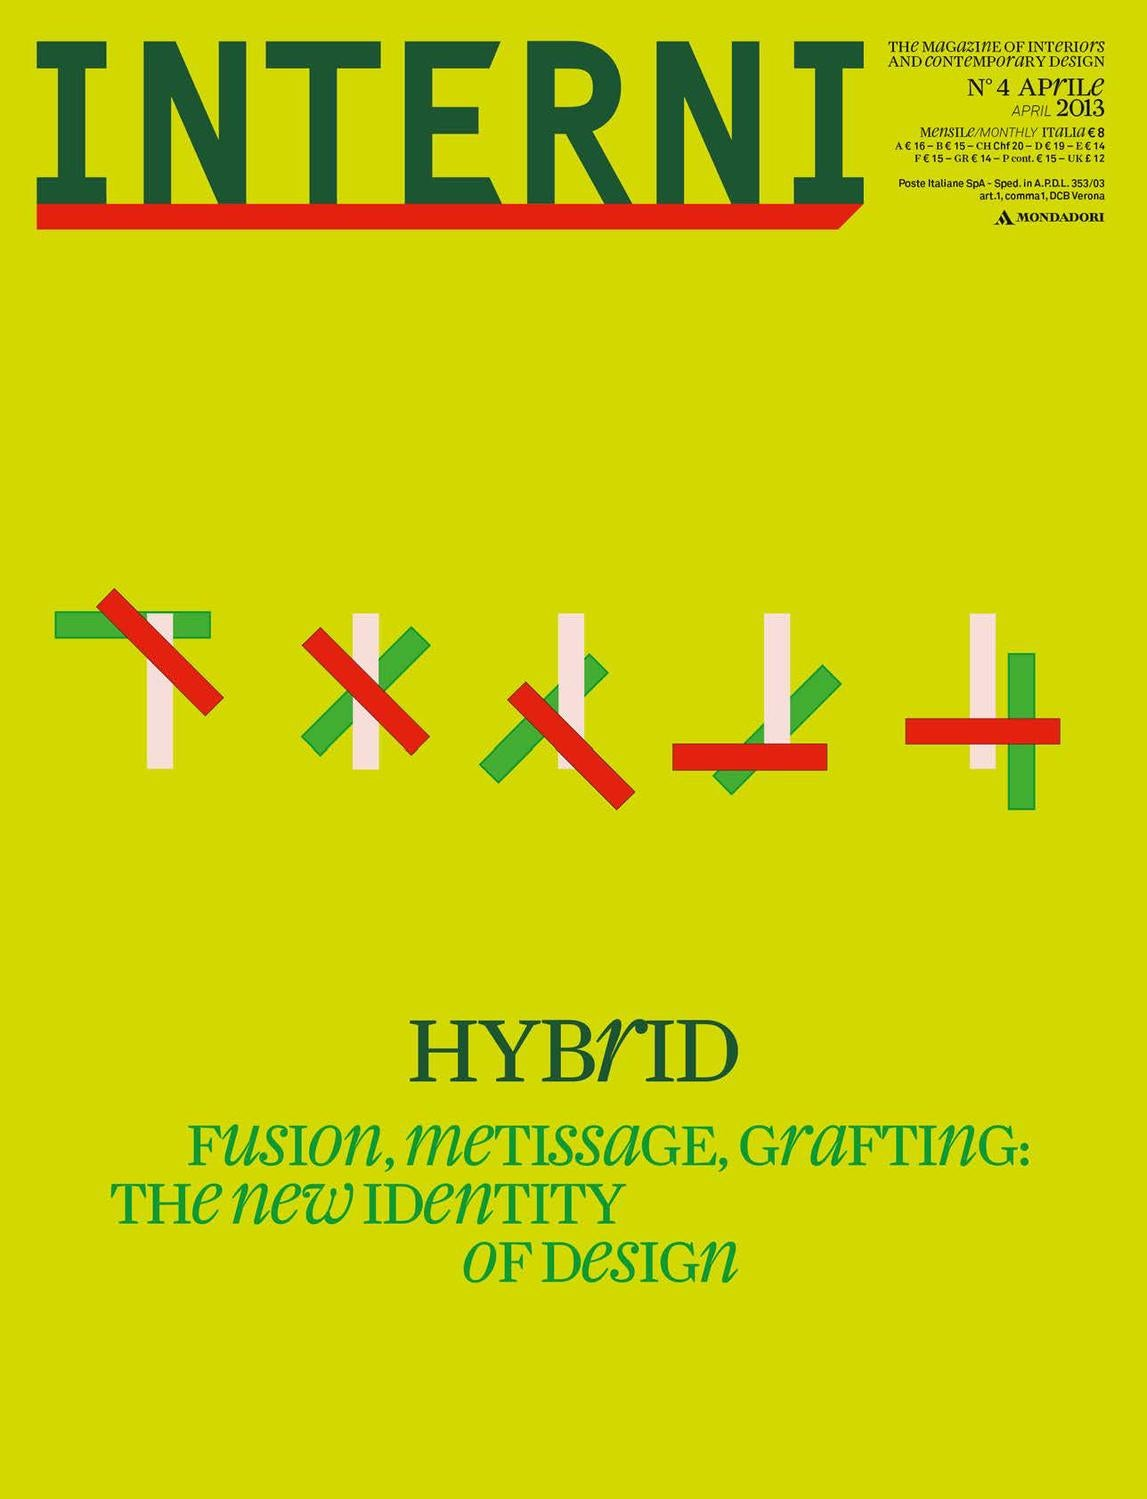 interni magazine 630 april 2013 by interni magazine issuu